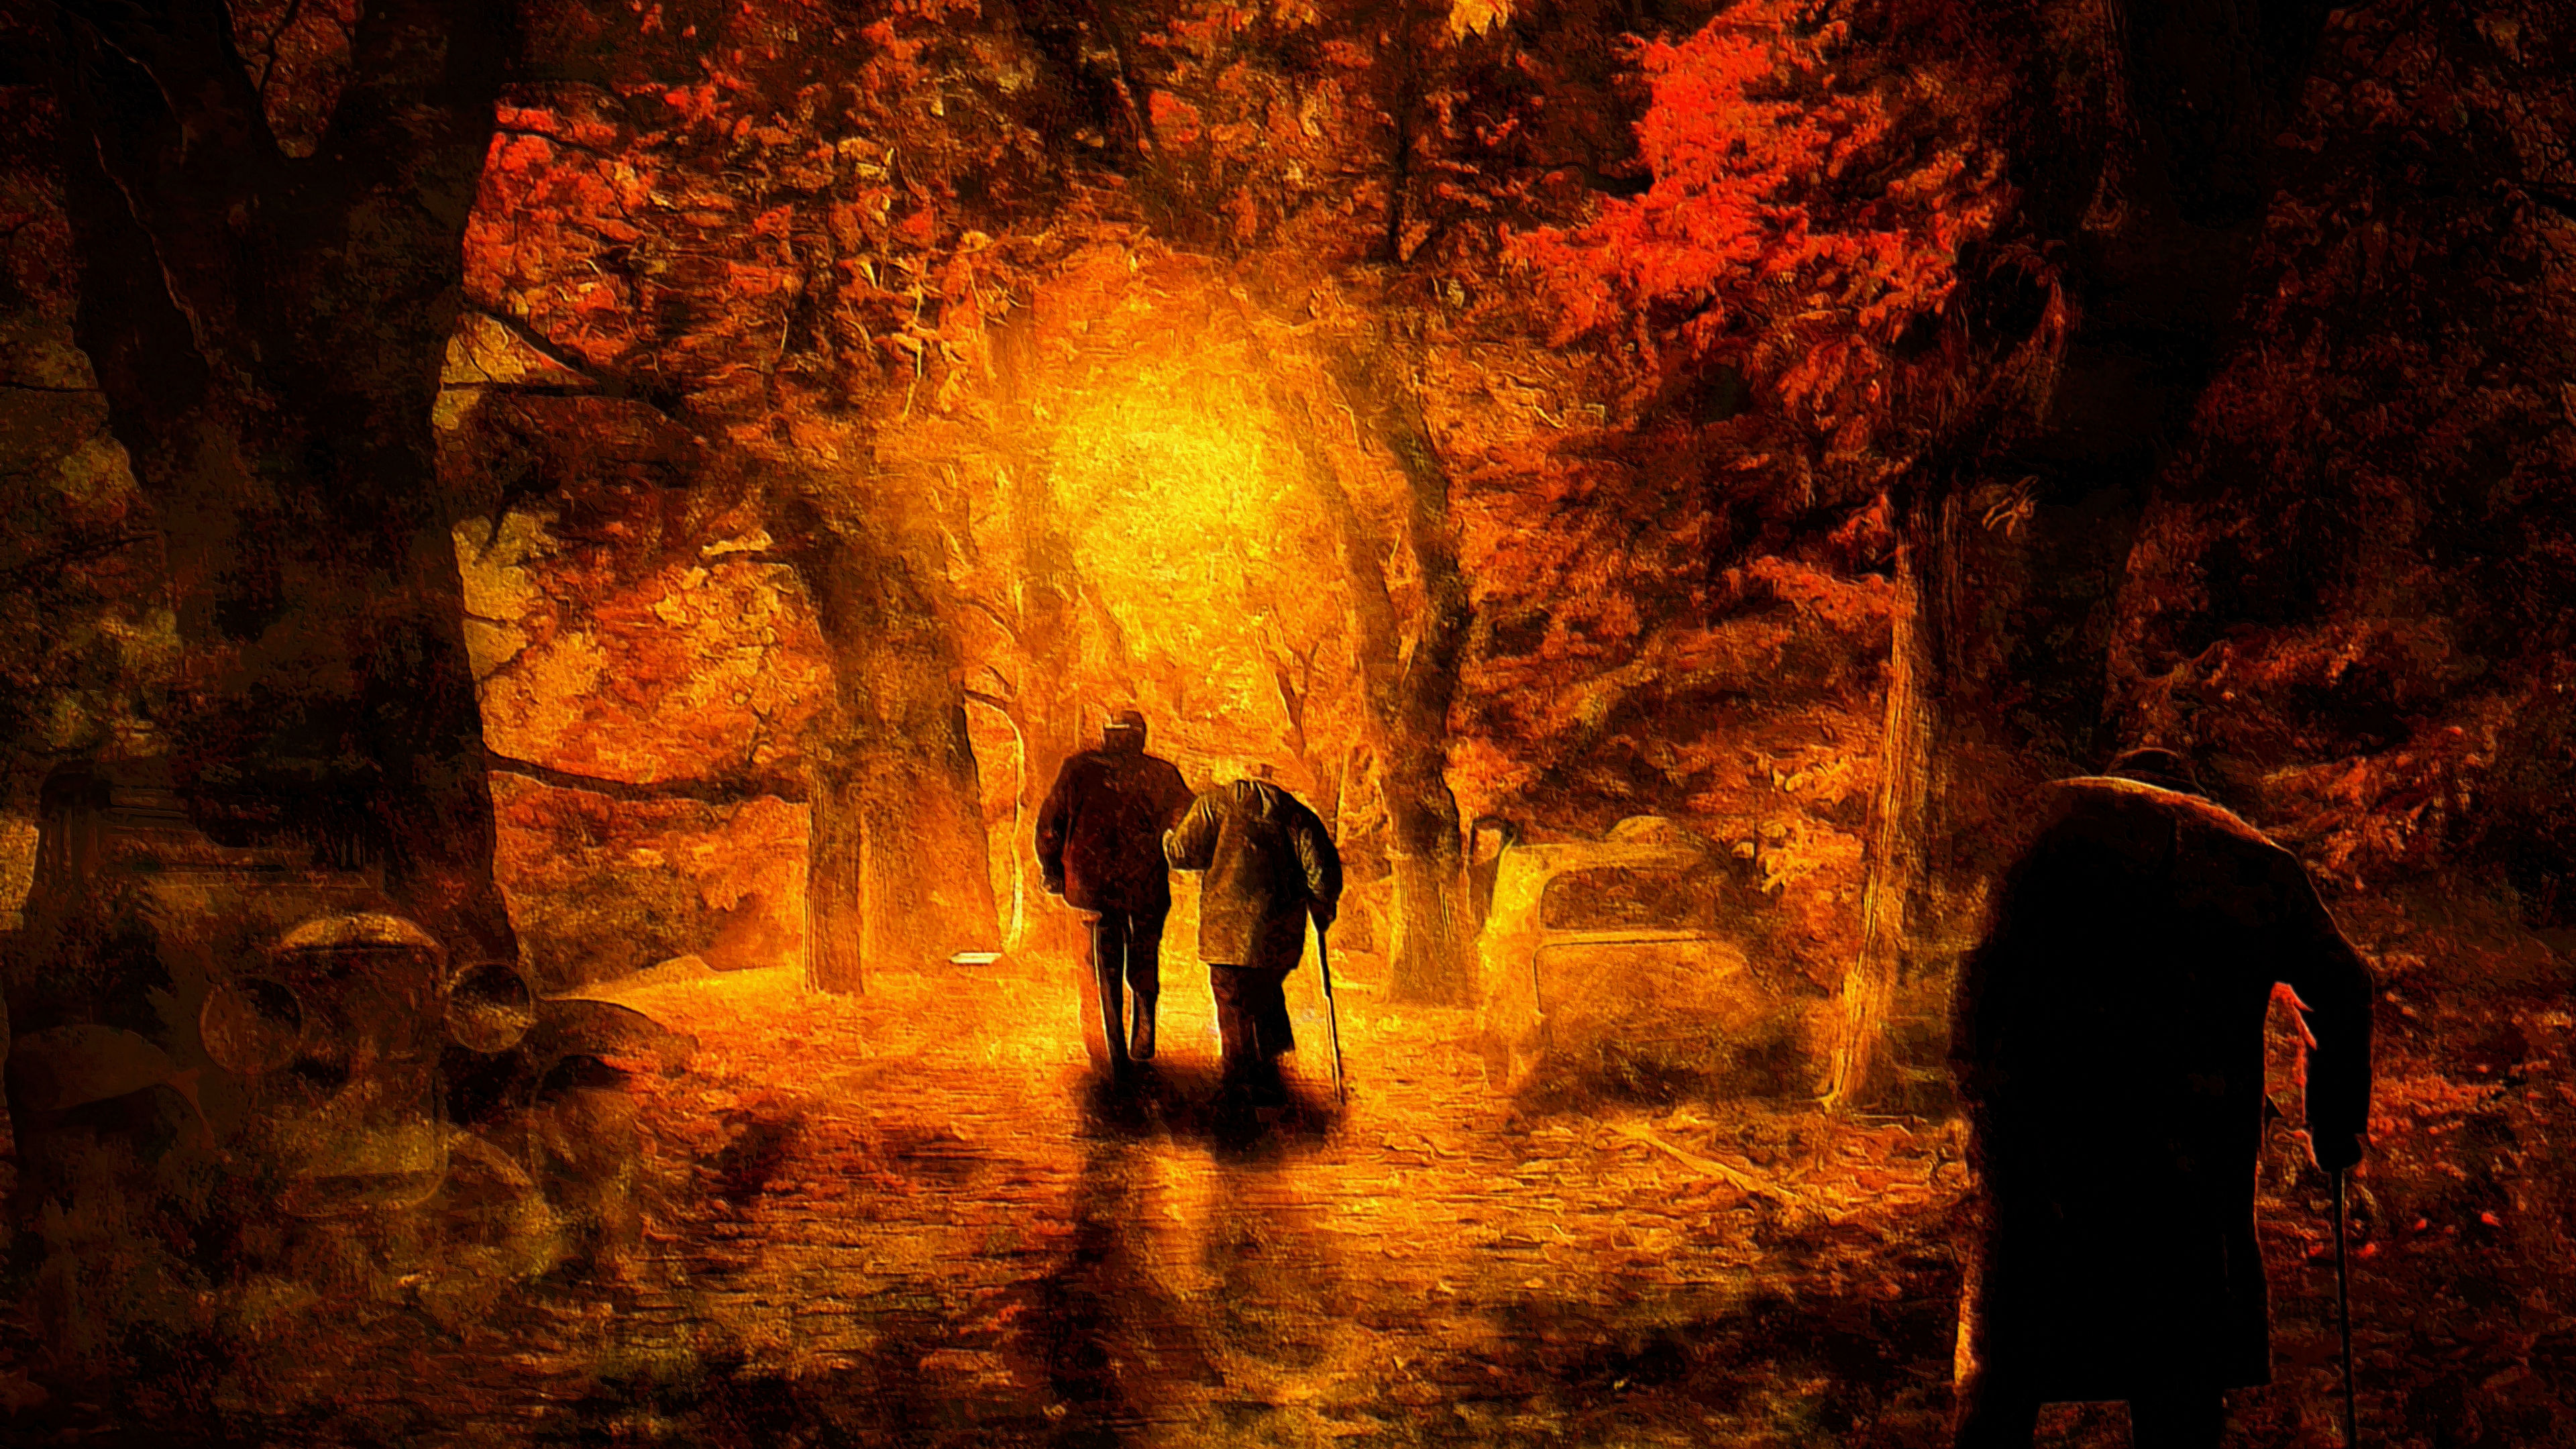 autumn of life painting 4k 1540755686 - Autumn Of Life Painting 4k - hd-wallpapers, digital art wallpapers, deviantart wallpapers, autumn wallpapers, artwork wallpapers, artist wallpapers, 8k wallpapers, 5k wallpapers, 4k-wallpapers